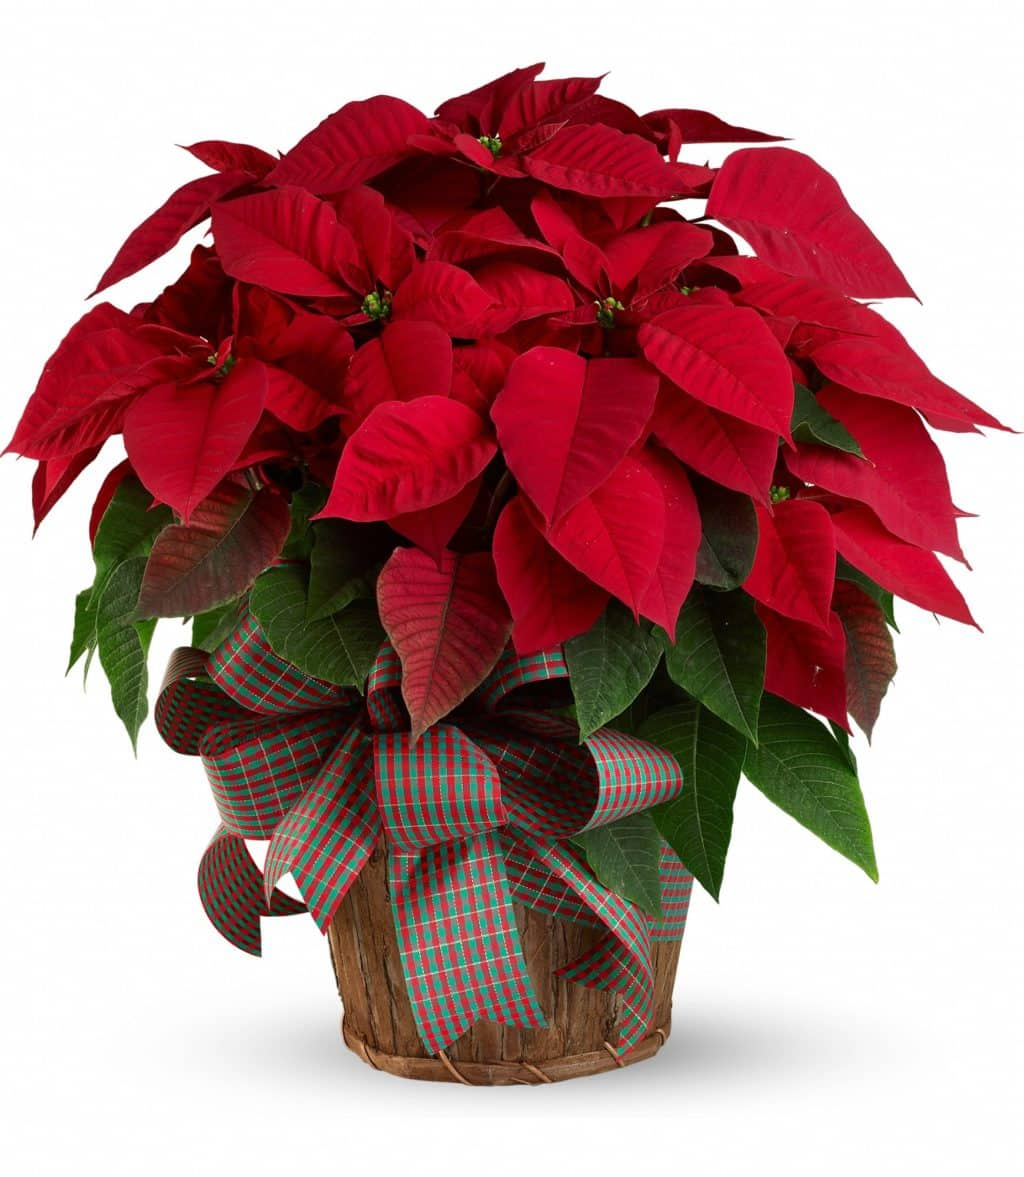 Комнатный цветок зеленый а верх красный